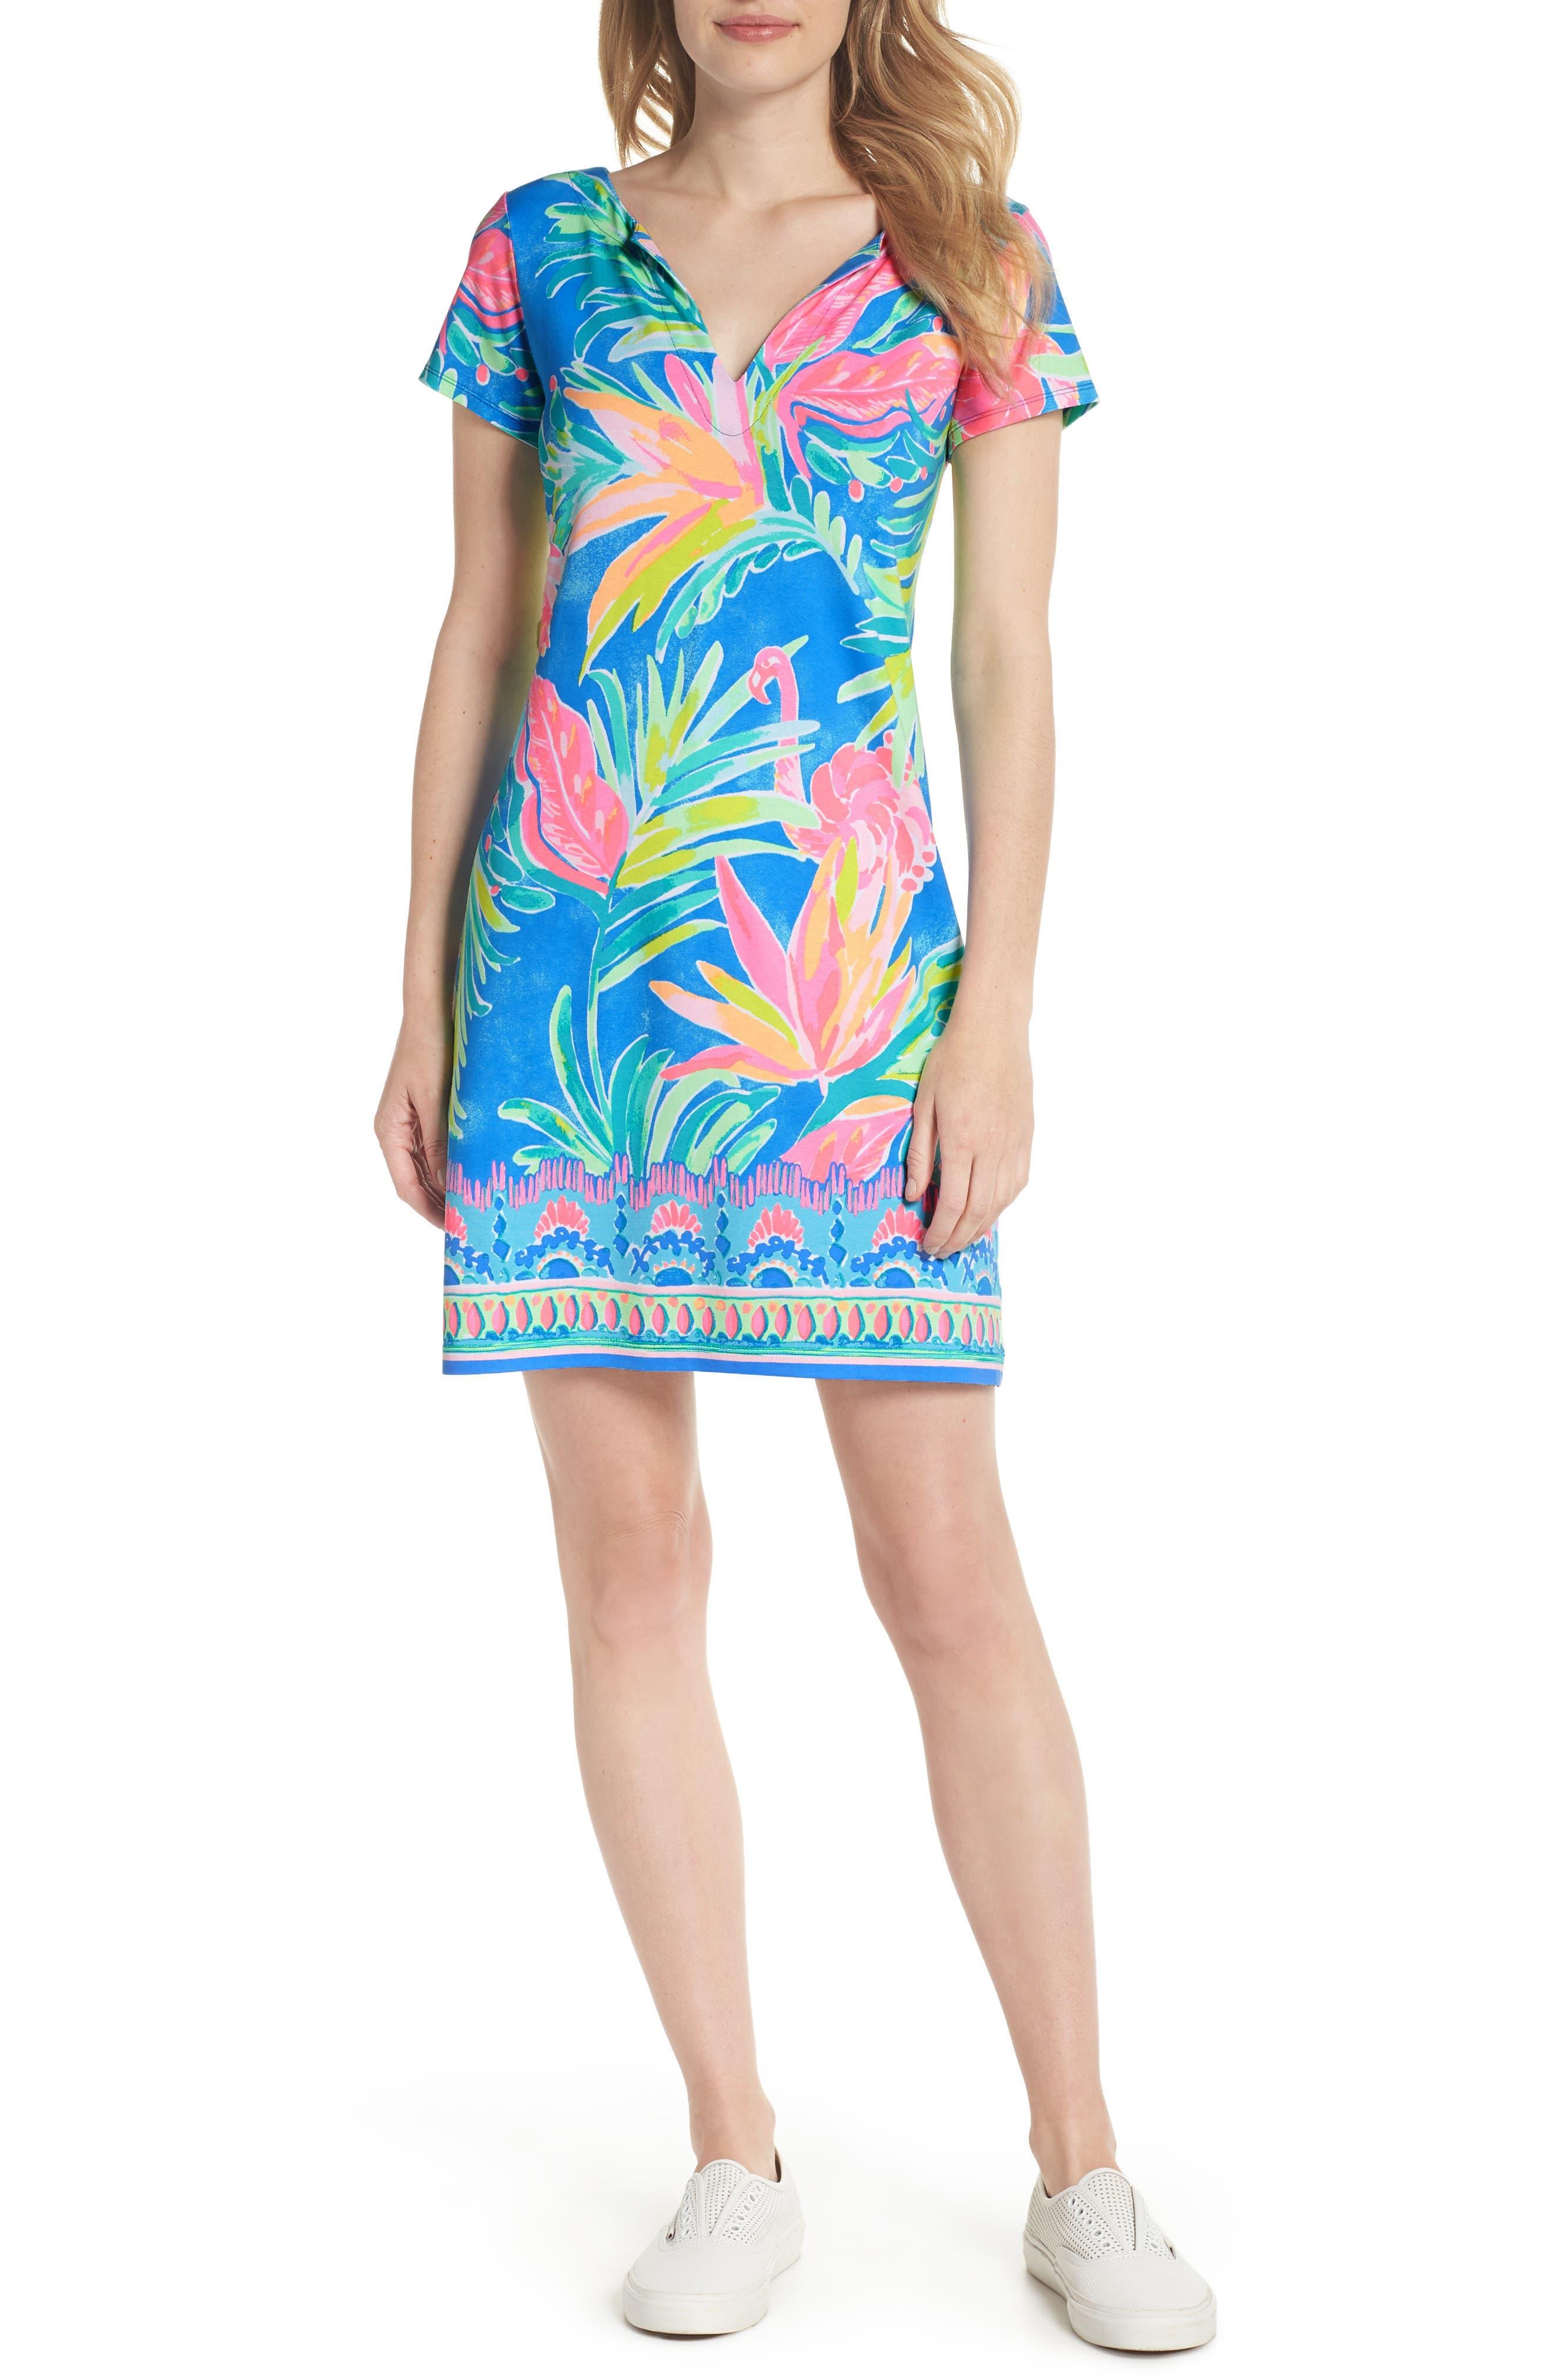 Sophiletta UPF 50+ Dress,                             Main thumbnail 1, color,                             420